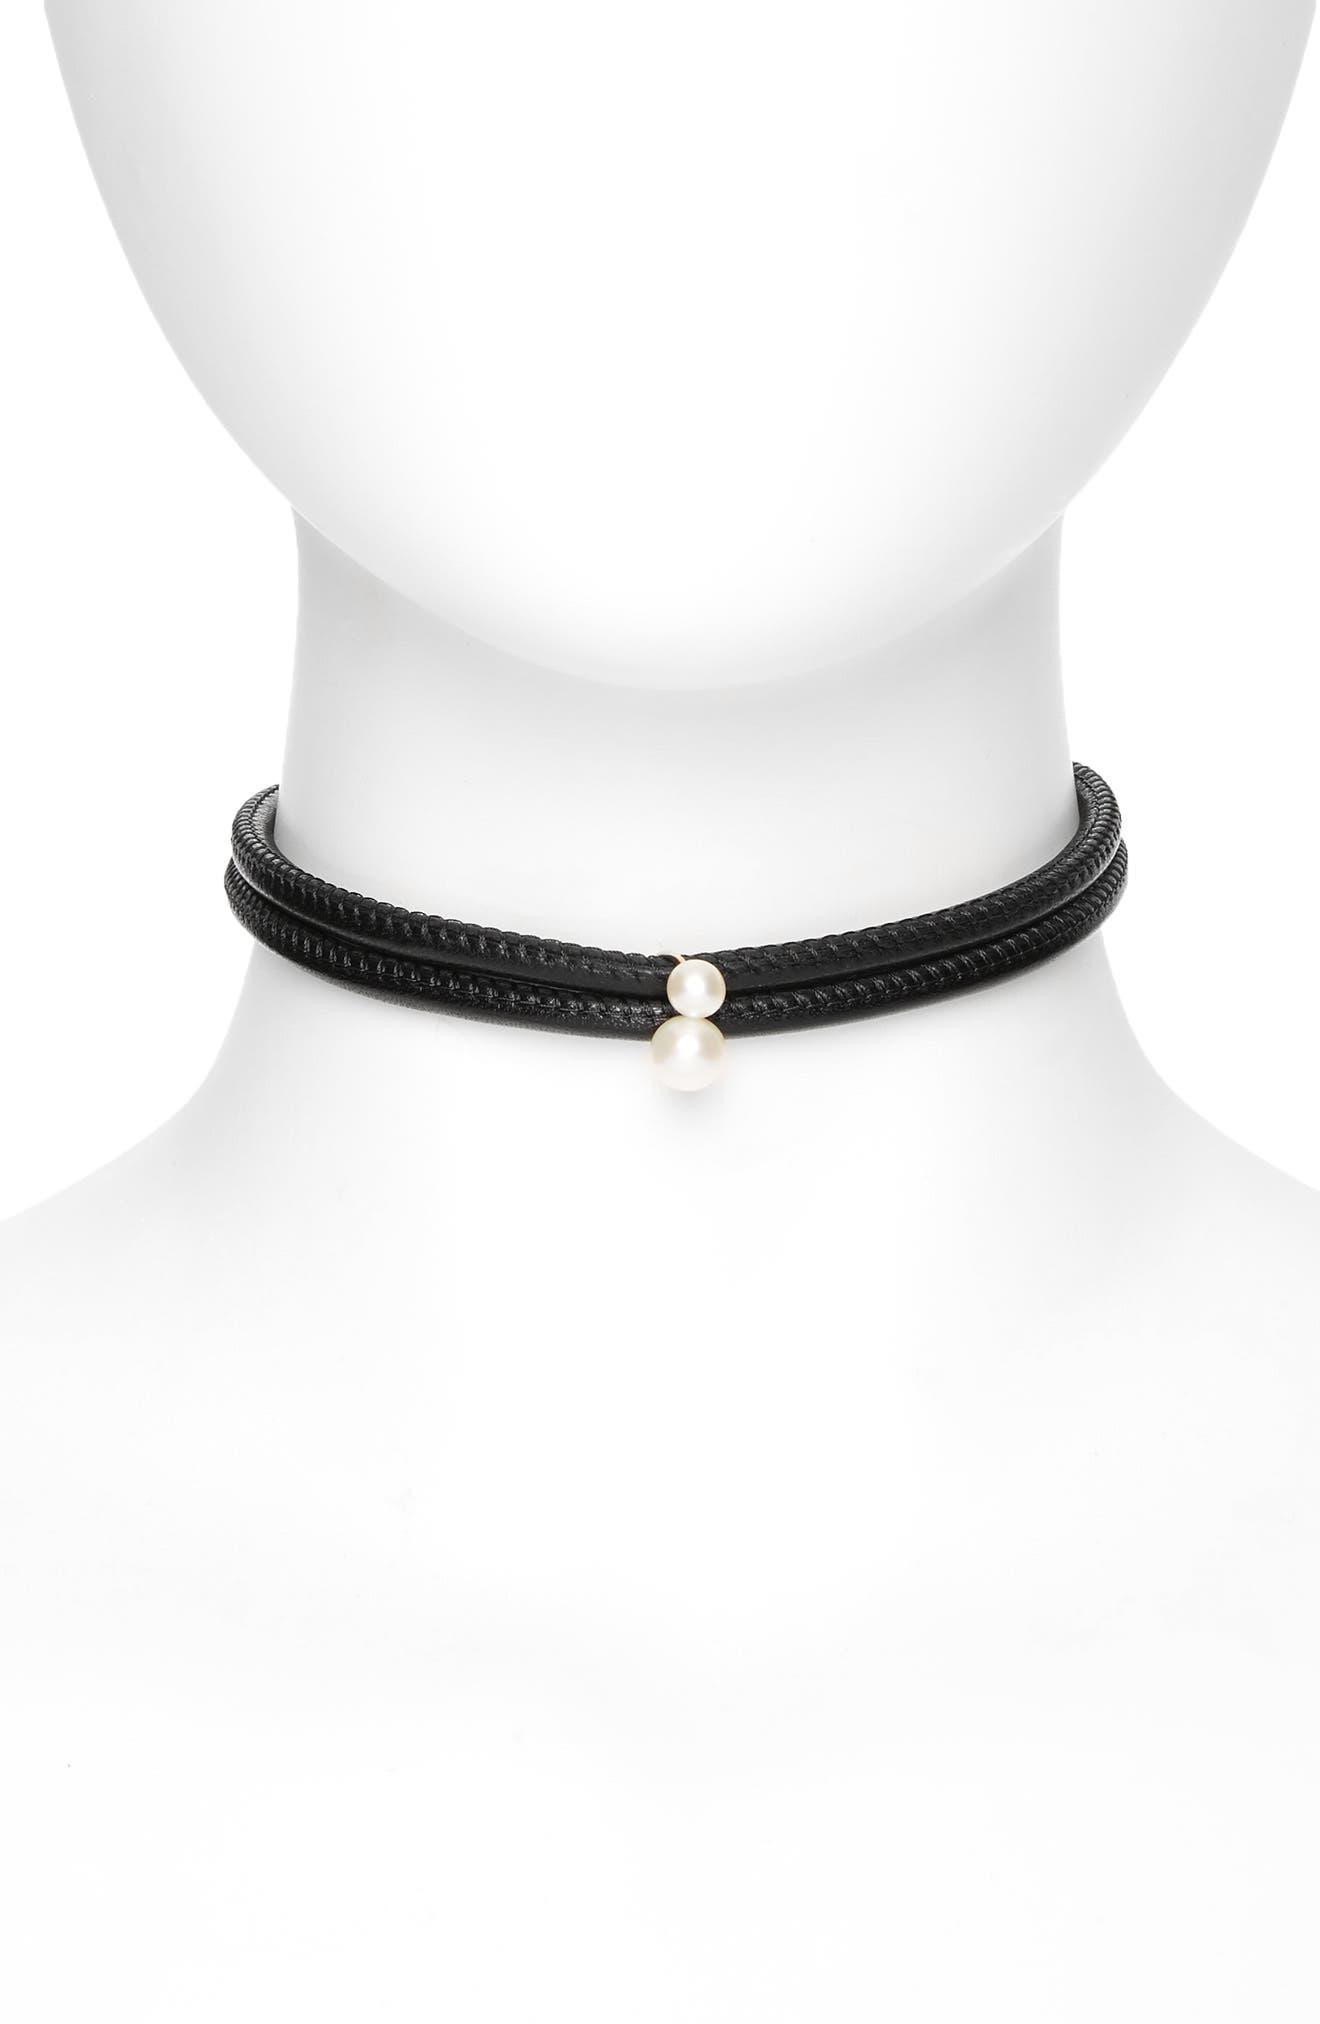 Mizuki Leather & Akoya Pearl Choker Necklace